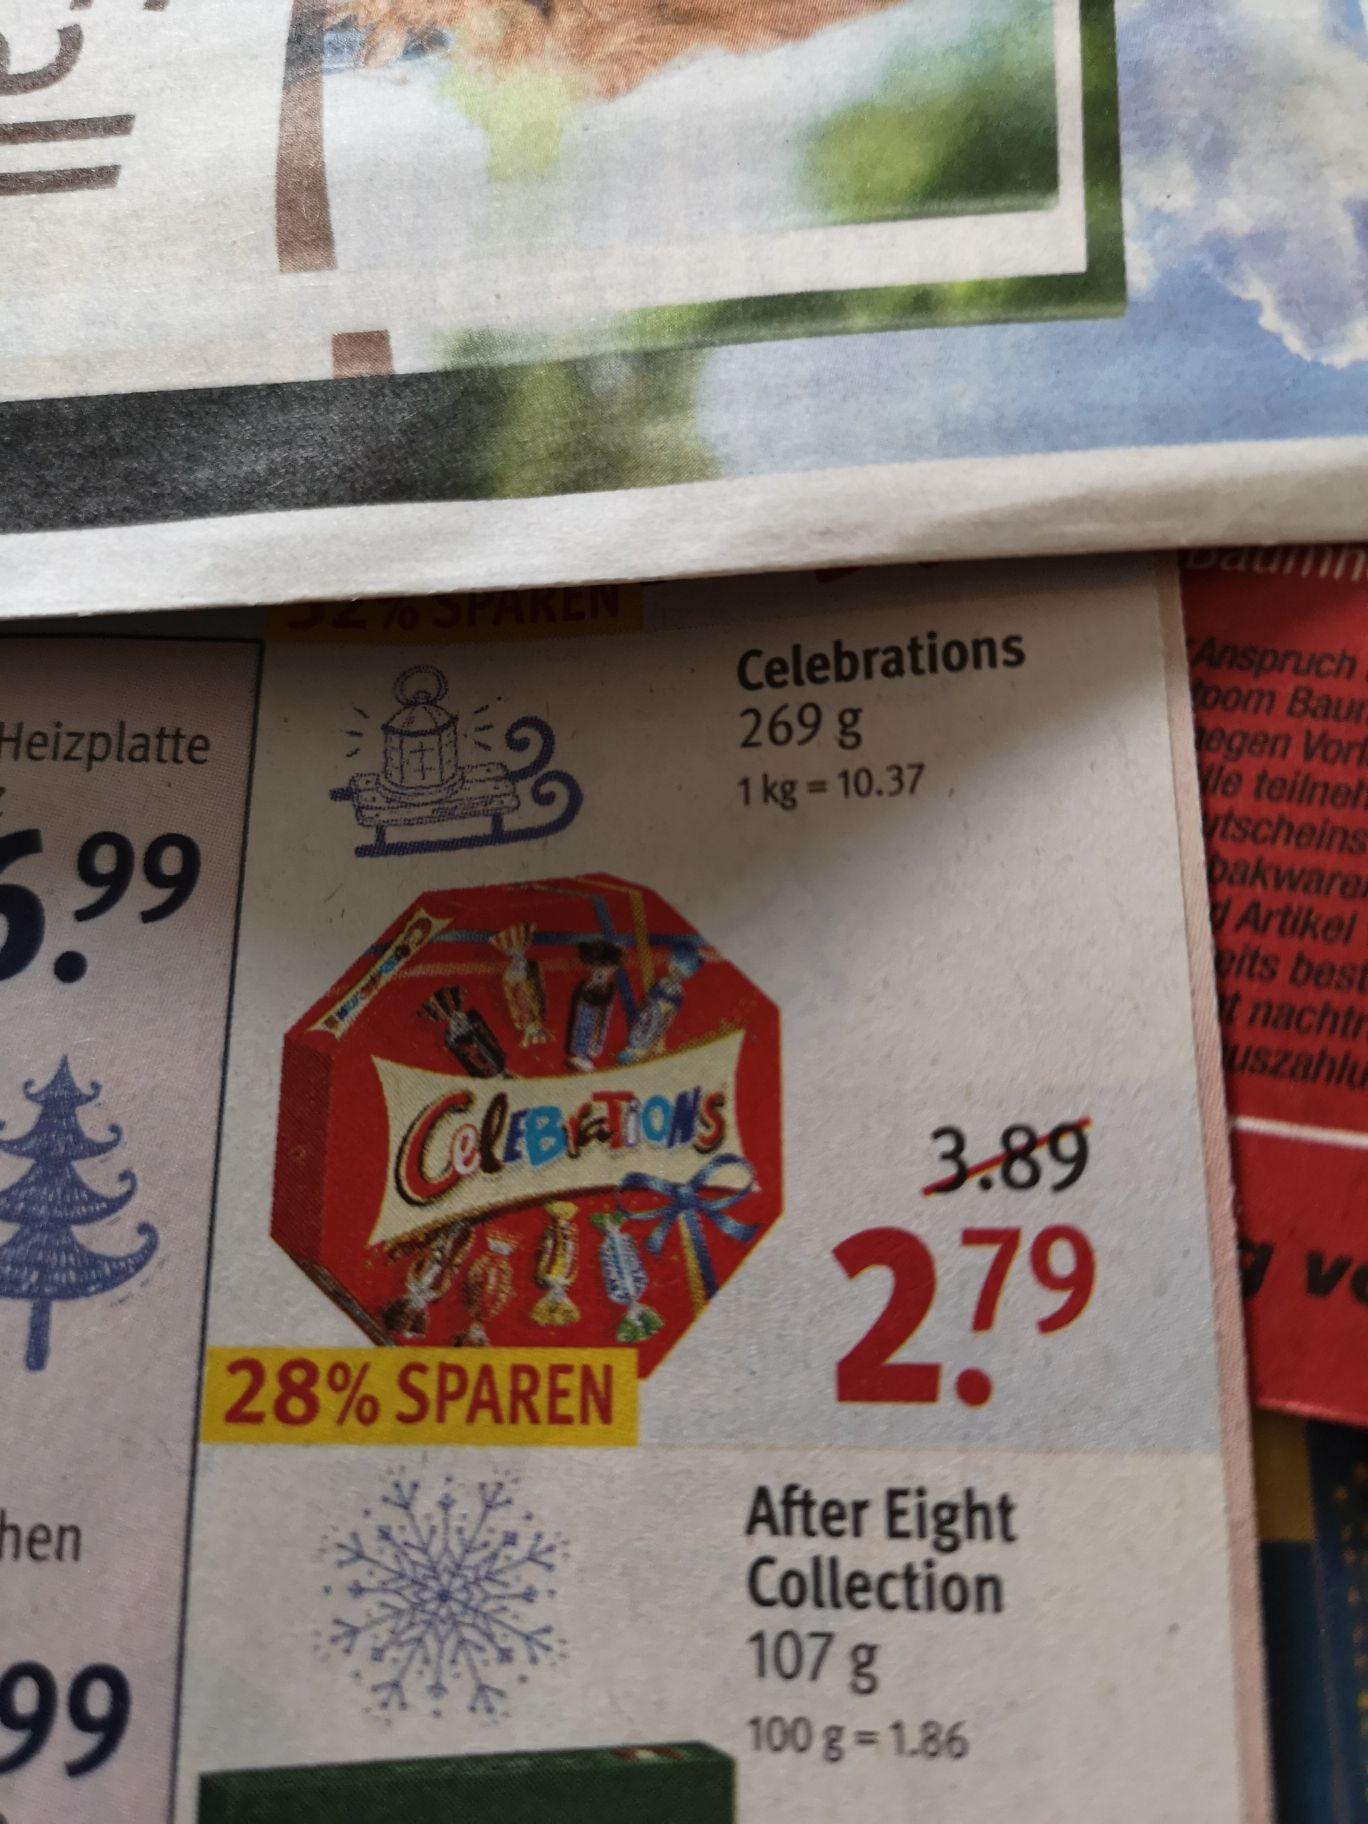 Celebrations 269g Packung für 2.51€  bei Rossmann 10% Coupon